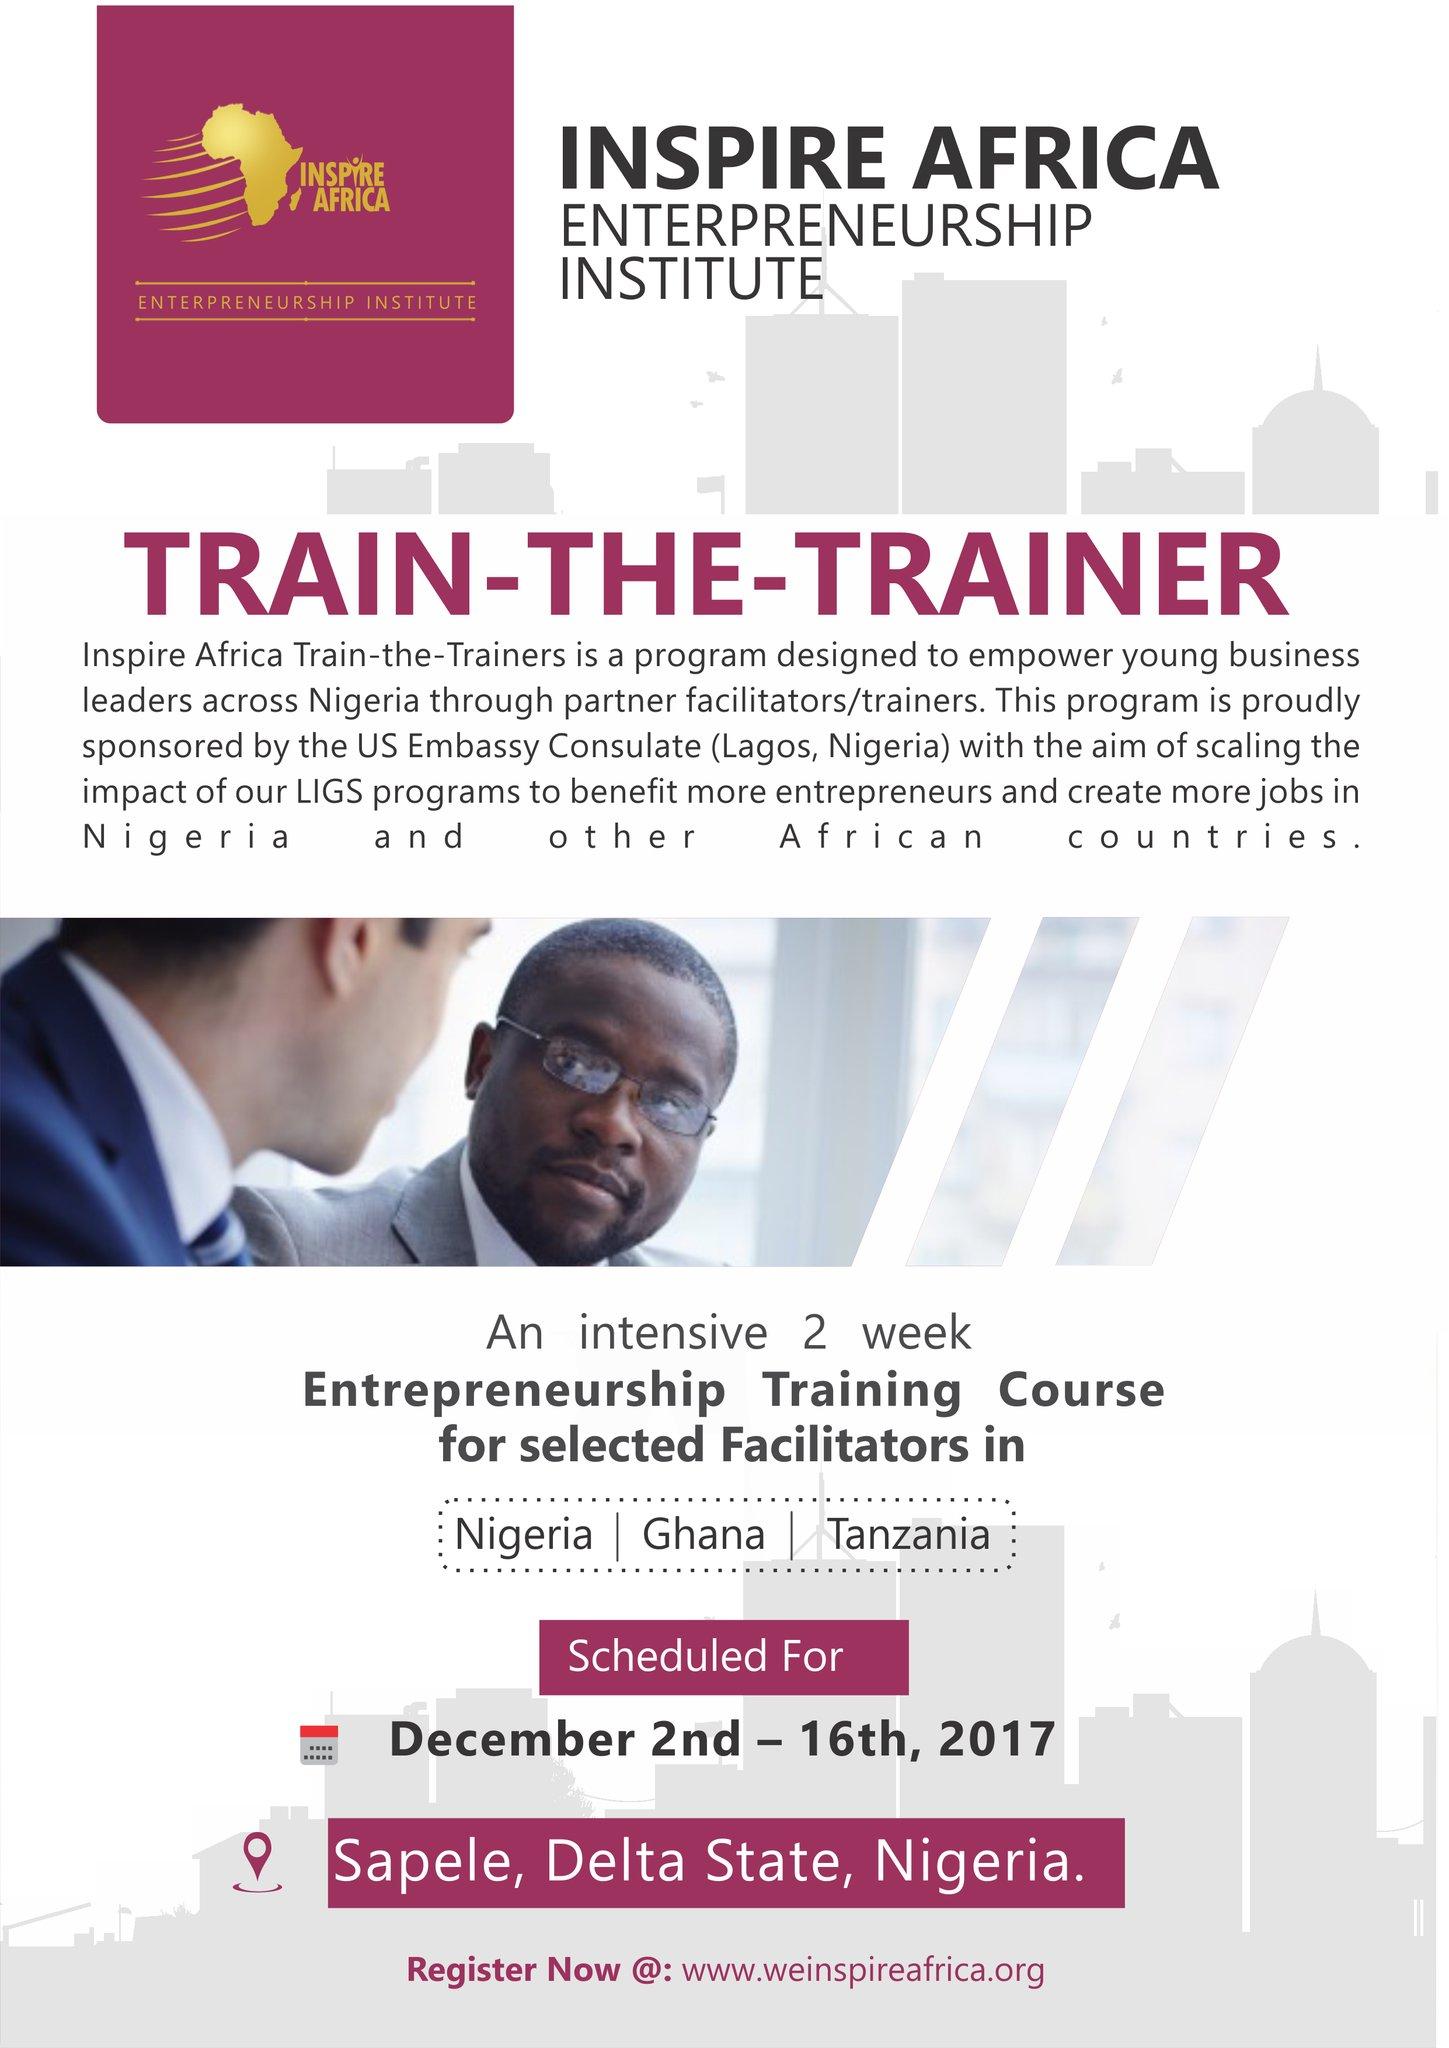 CALL FOR APPLICATION: INSPIRE AFRICA TRAIN-THE-TRAINERS ENTREPRENEURSHIP PROGRAM